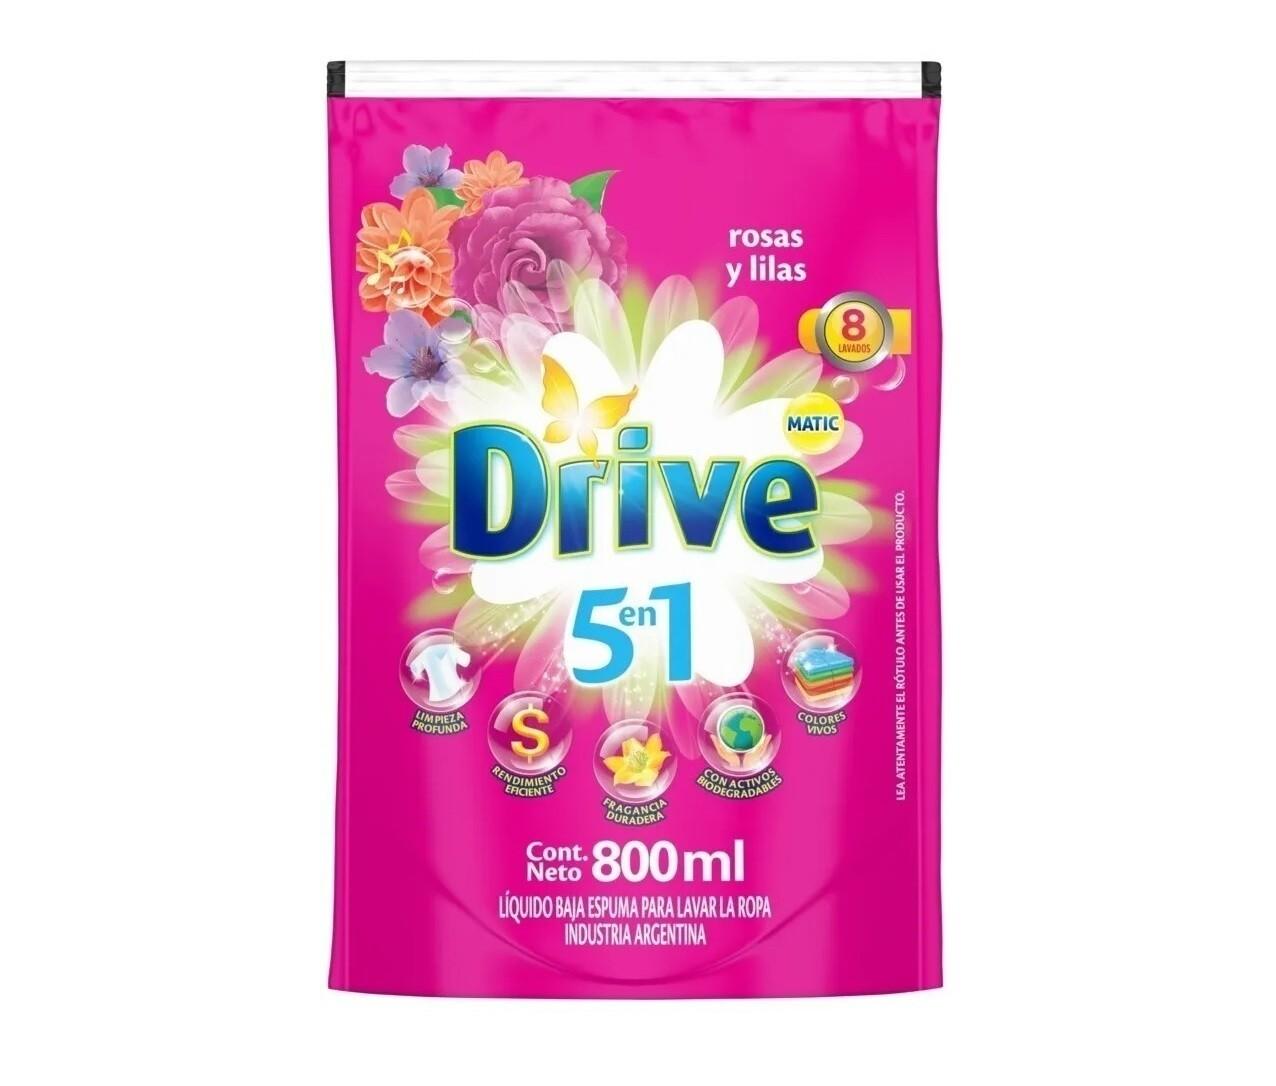 DRIVE MATIC DT LIQ RS Y LILAS DP x 800ML